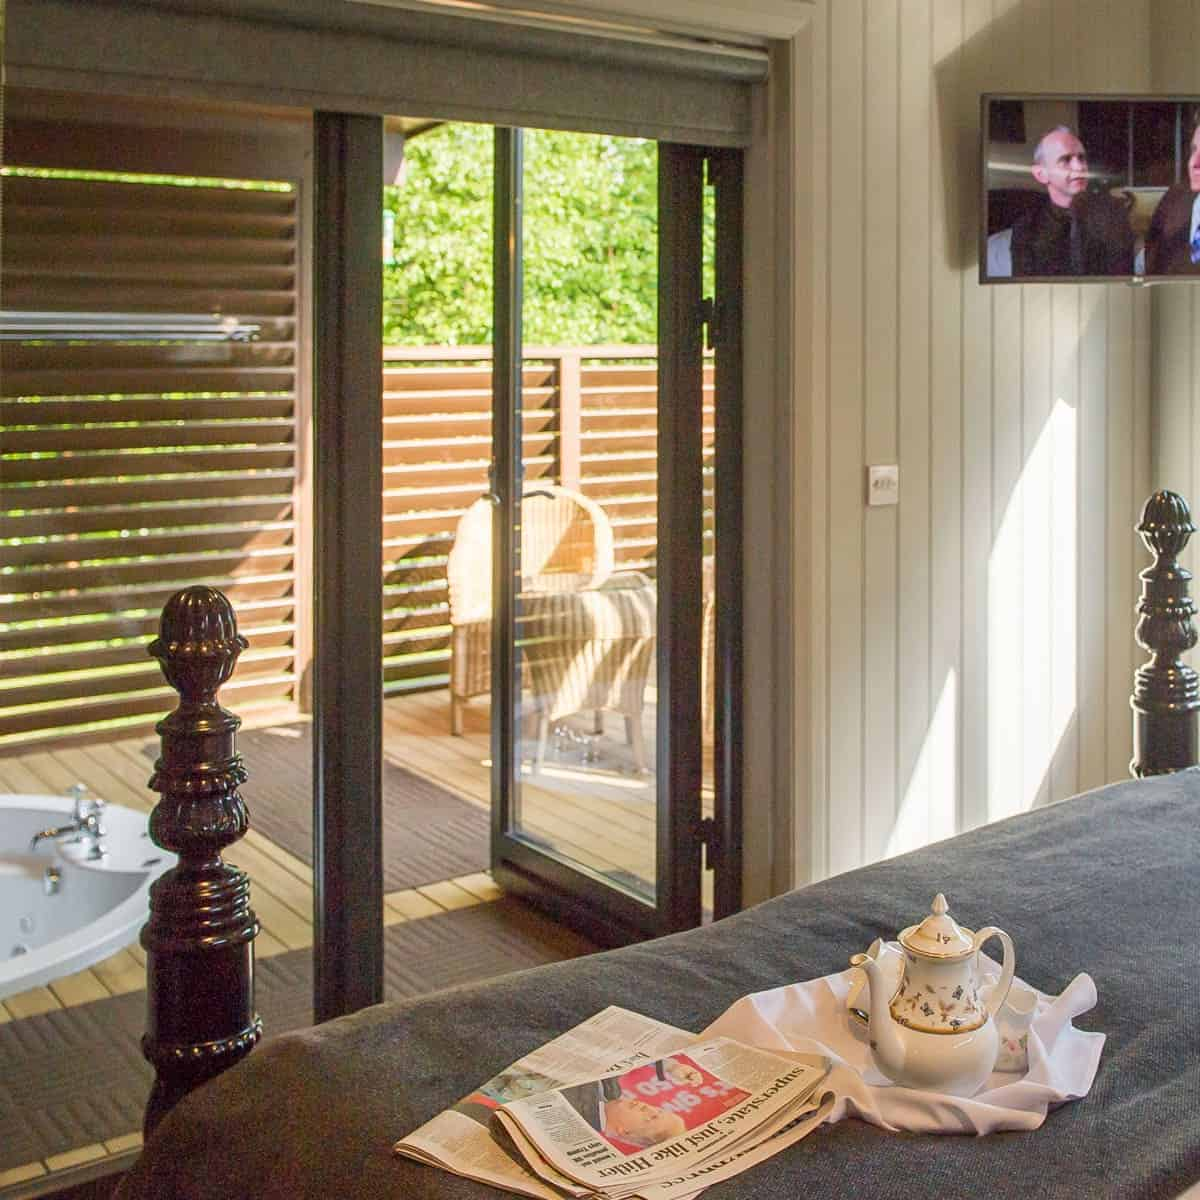 Luxury Hotel Windermere Broadoaks The Retreat Gallery Image 1